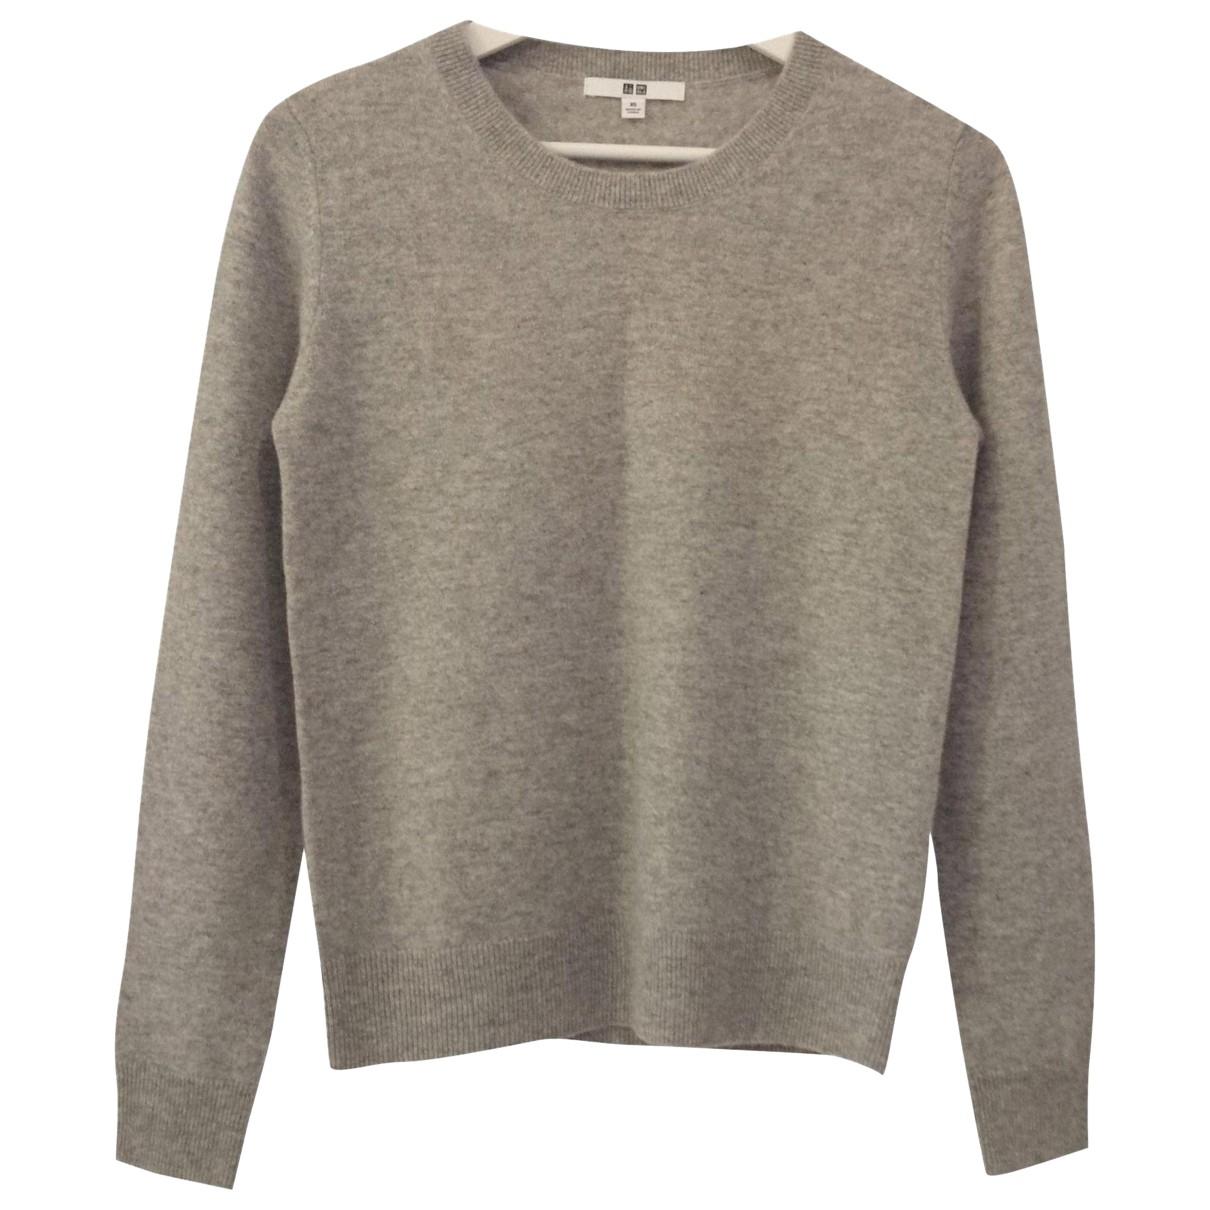 Uniqlo N Grey Cashmere Knitwear for Women XS International